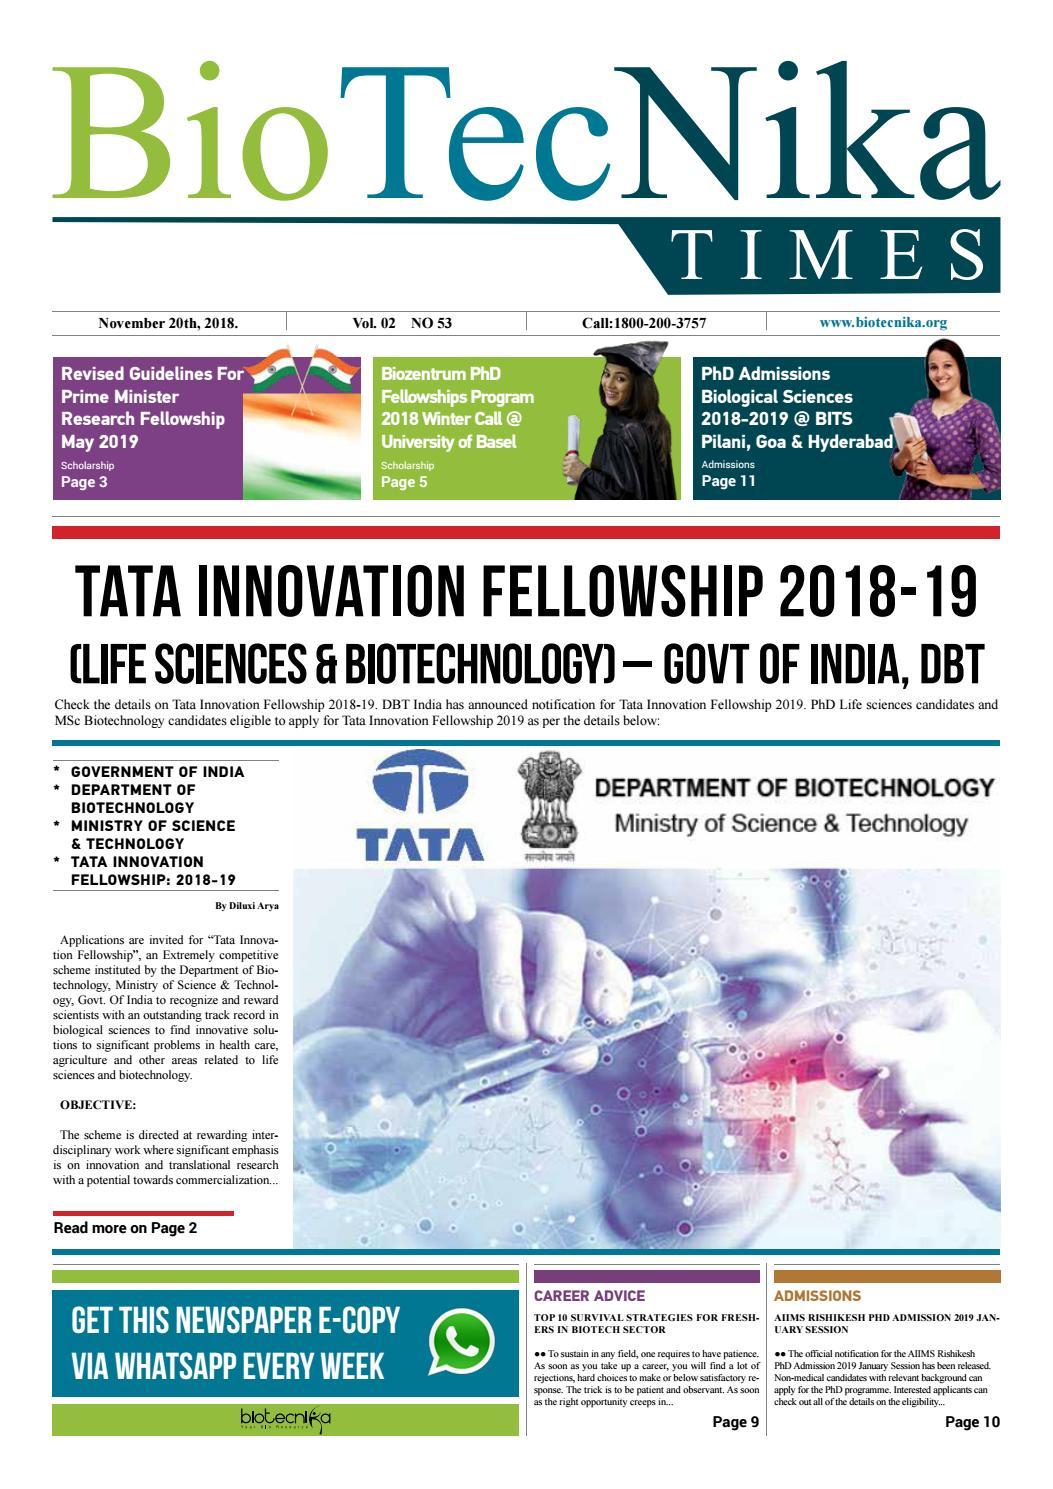 Biotecnika Times - Newspaper dated 20th November 2018 by